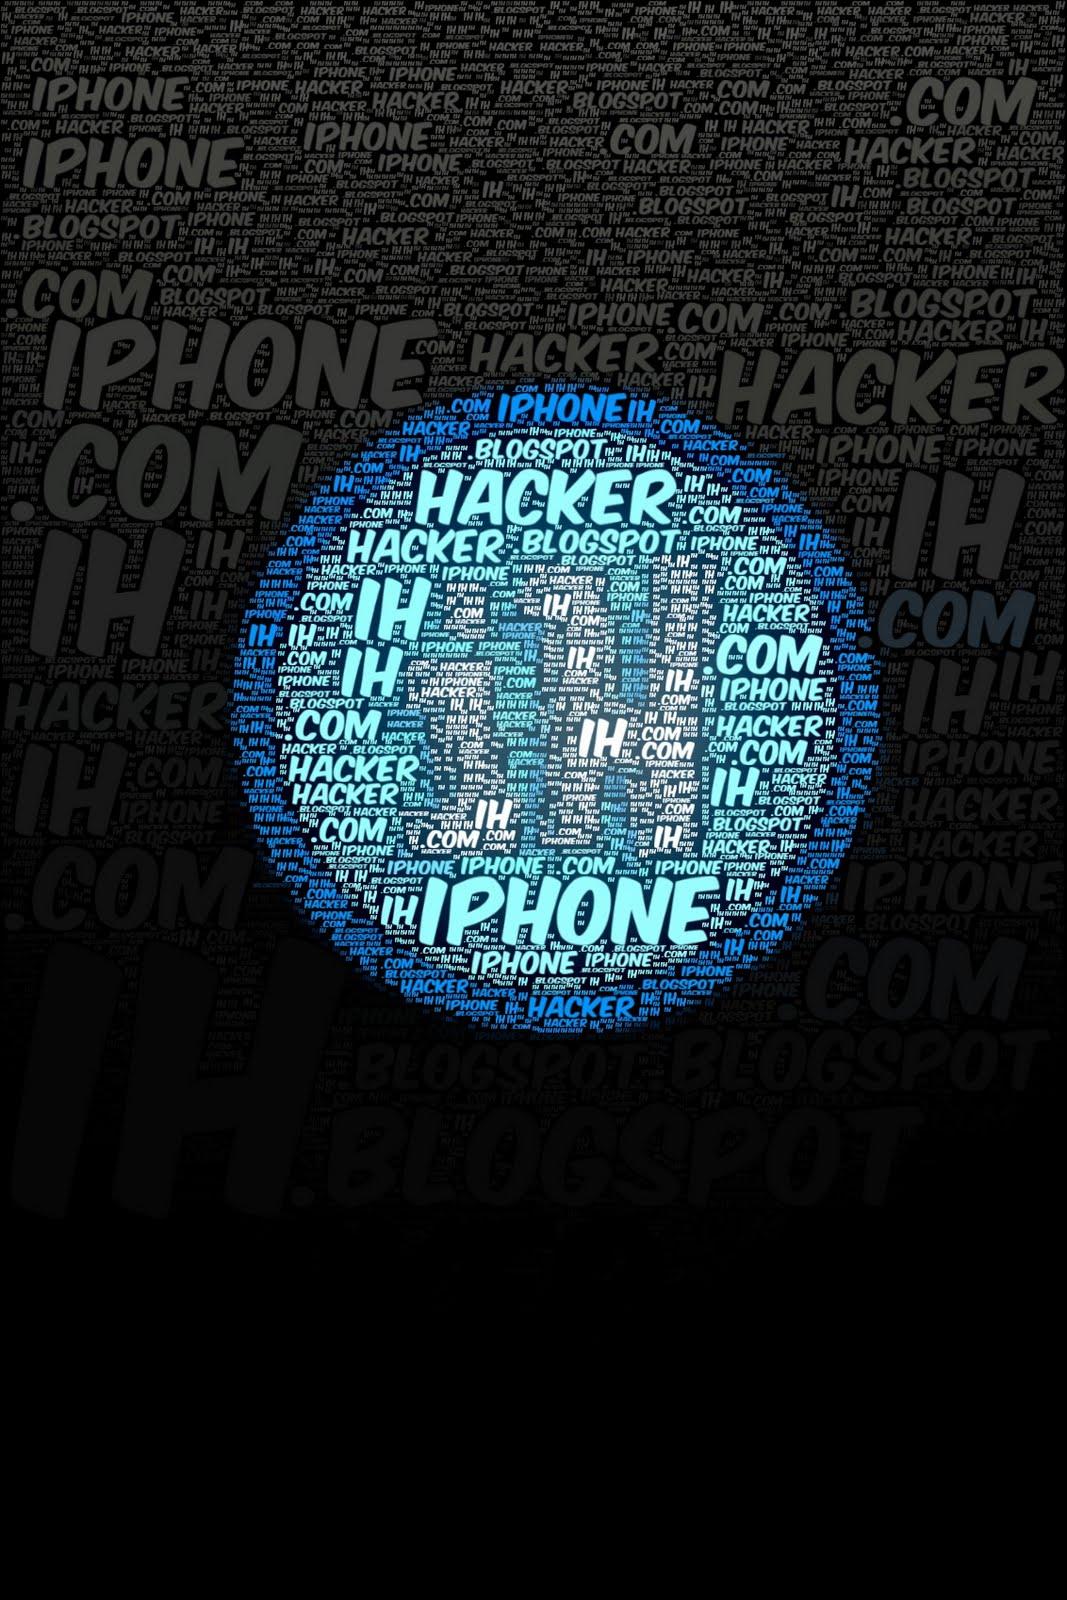 hack toolк для айфона